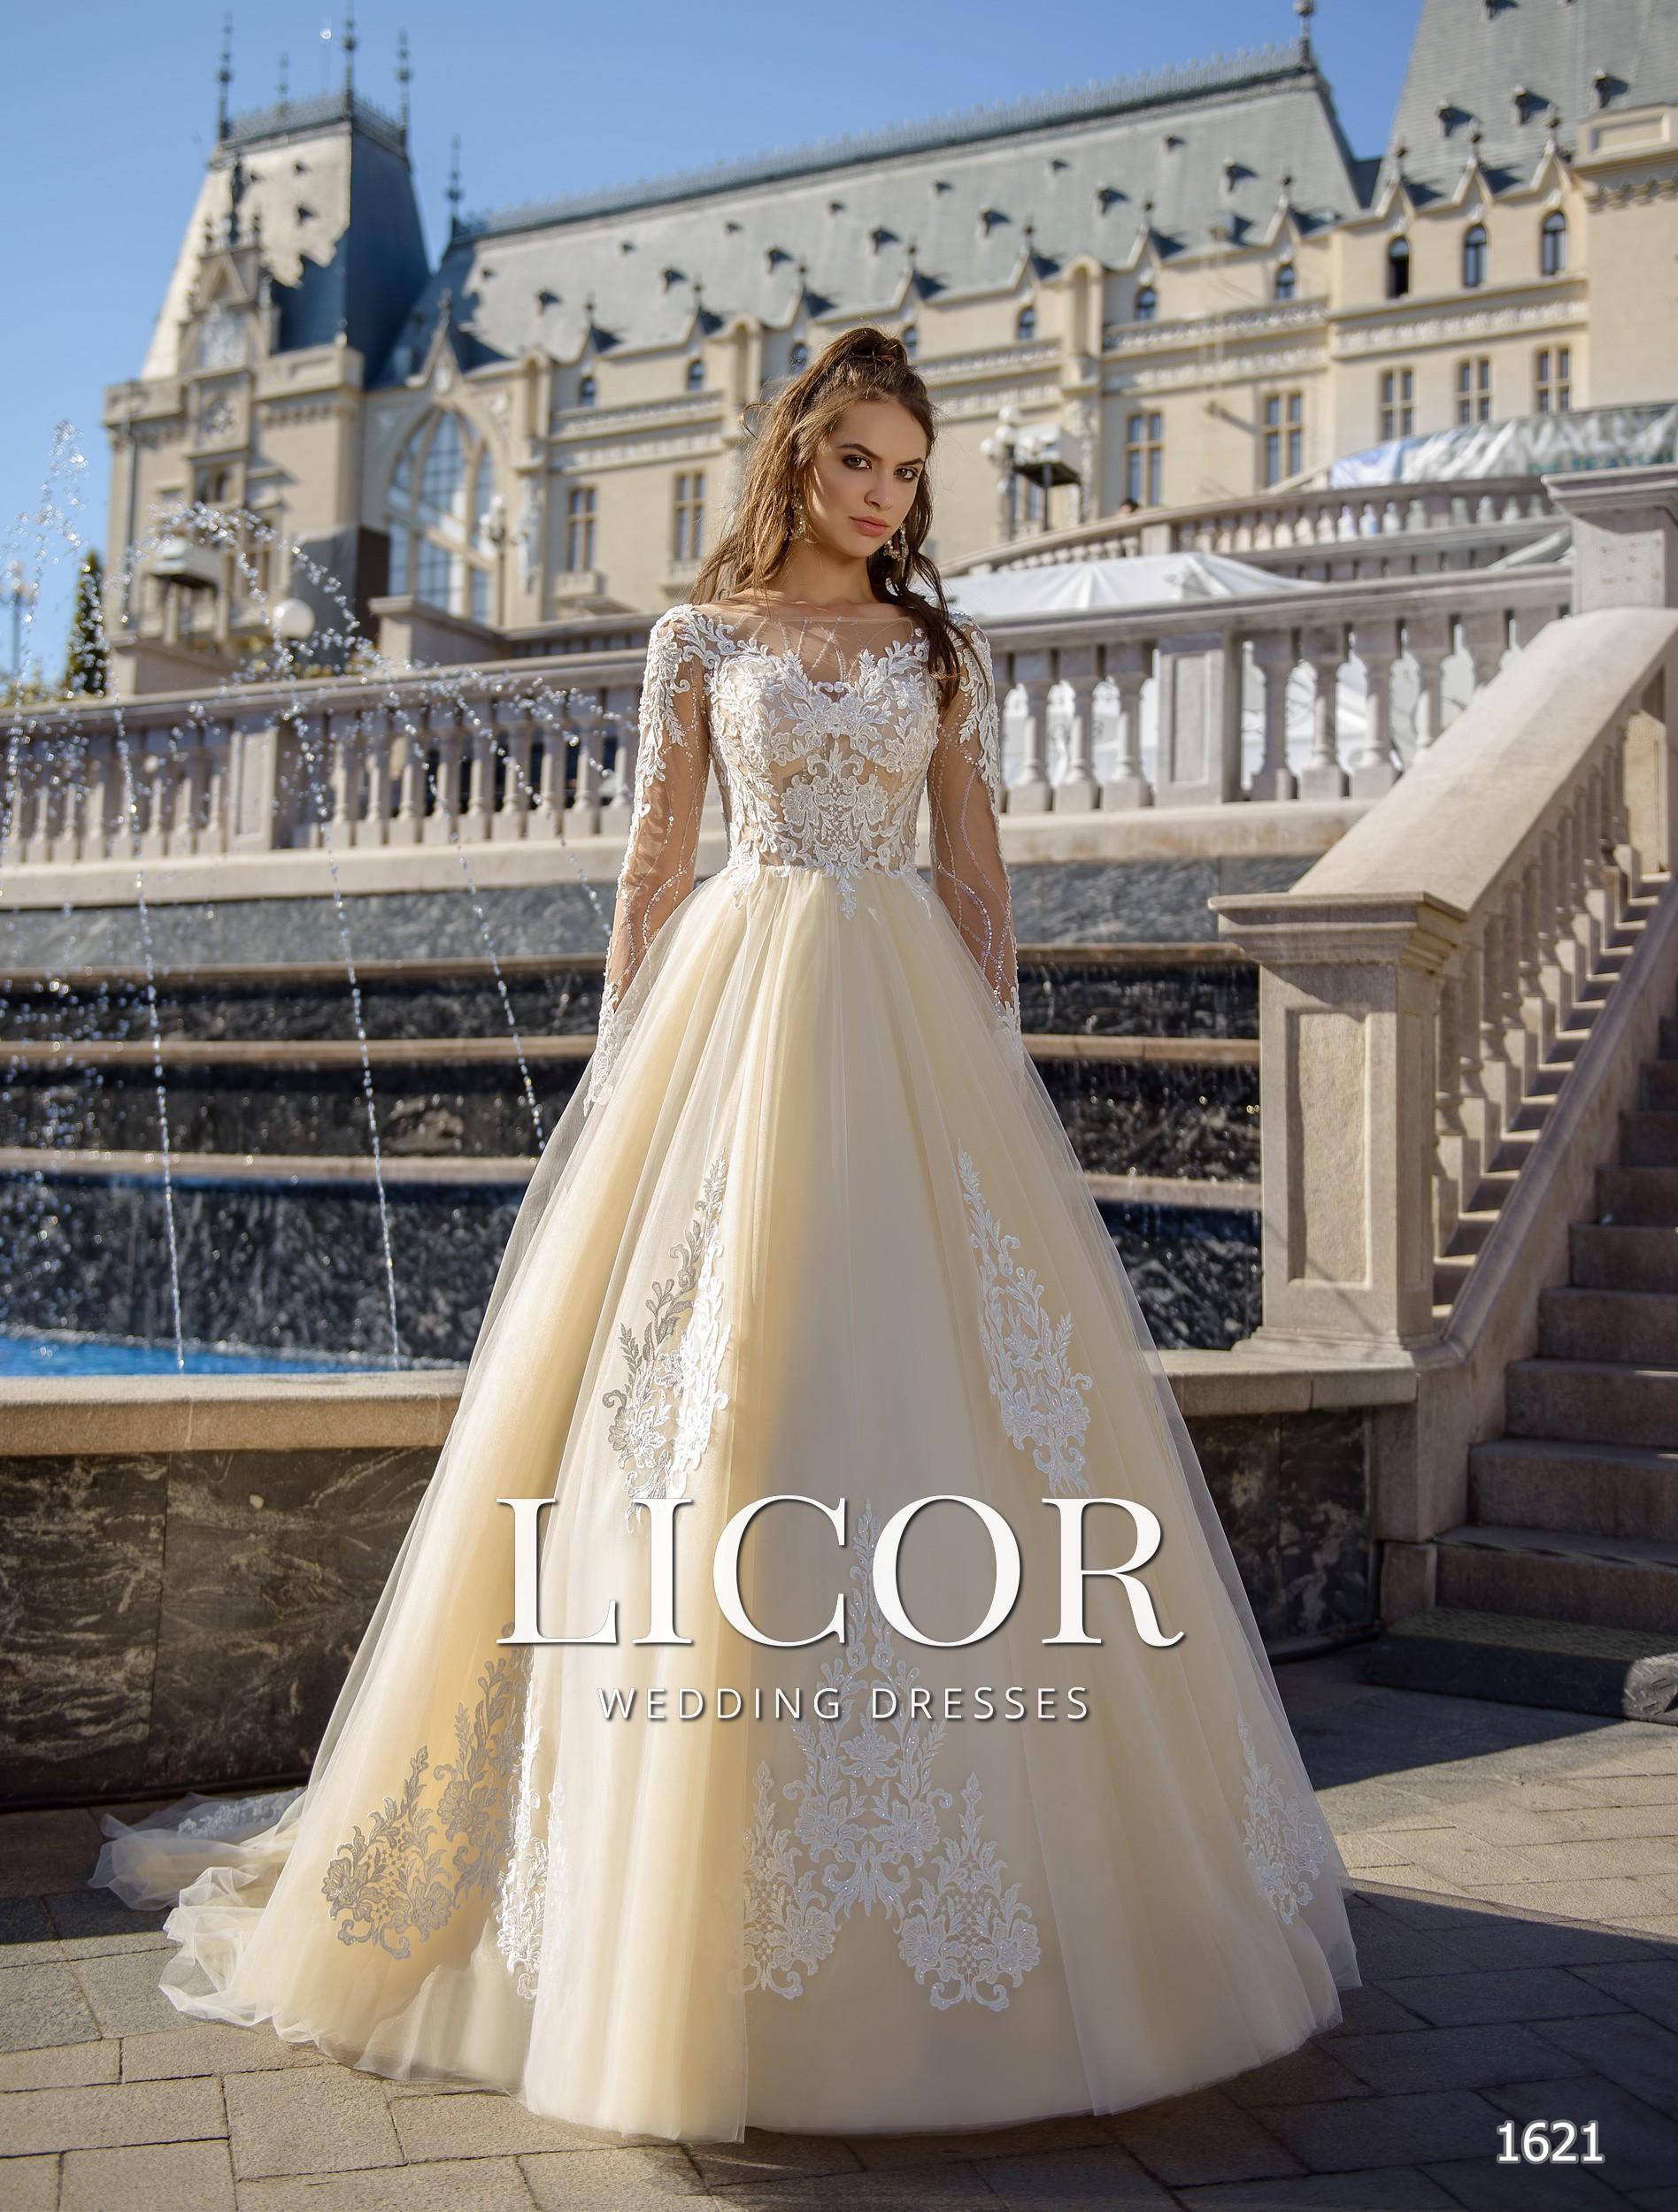 http://licor.com.ua/images/stories/virtuemart/product/1621(1).jpg